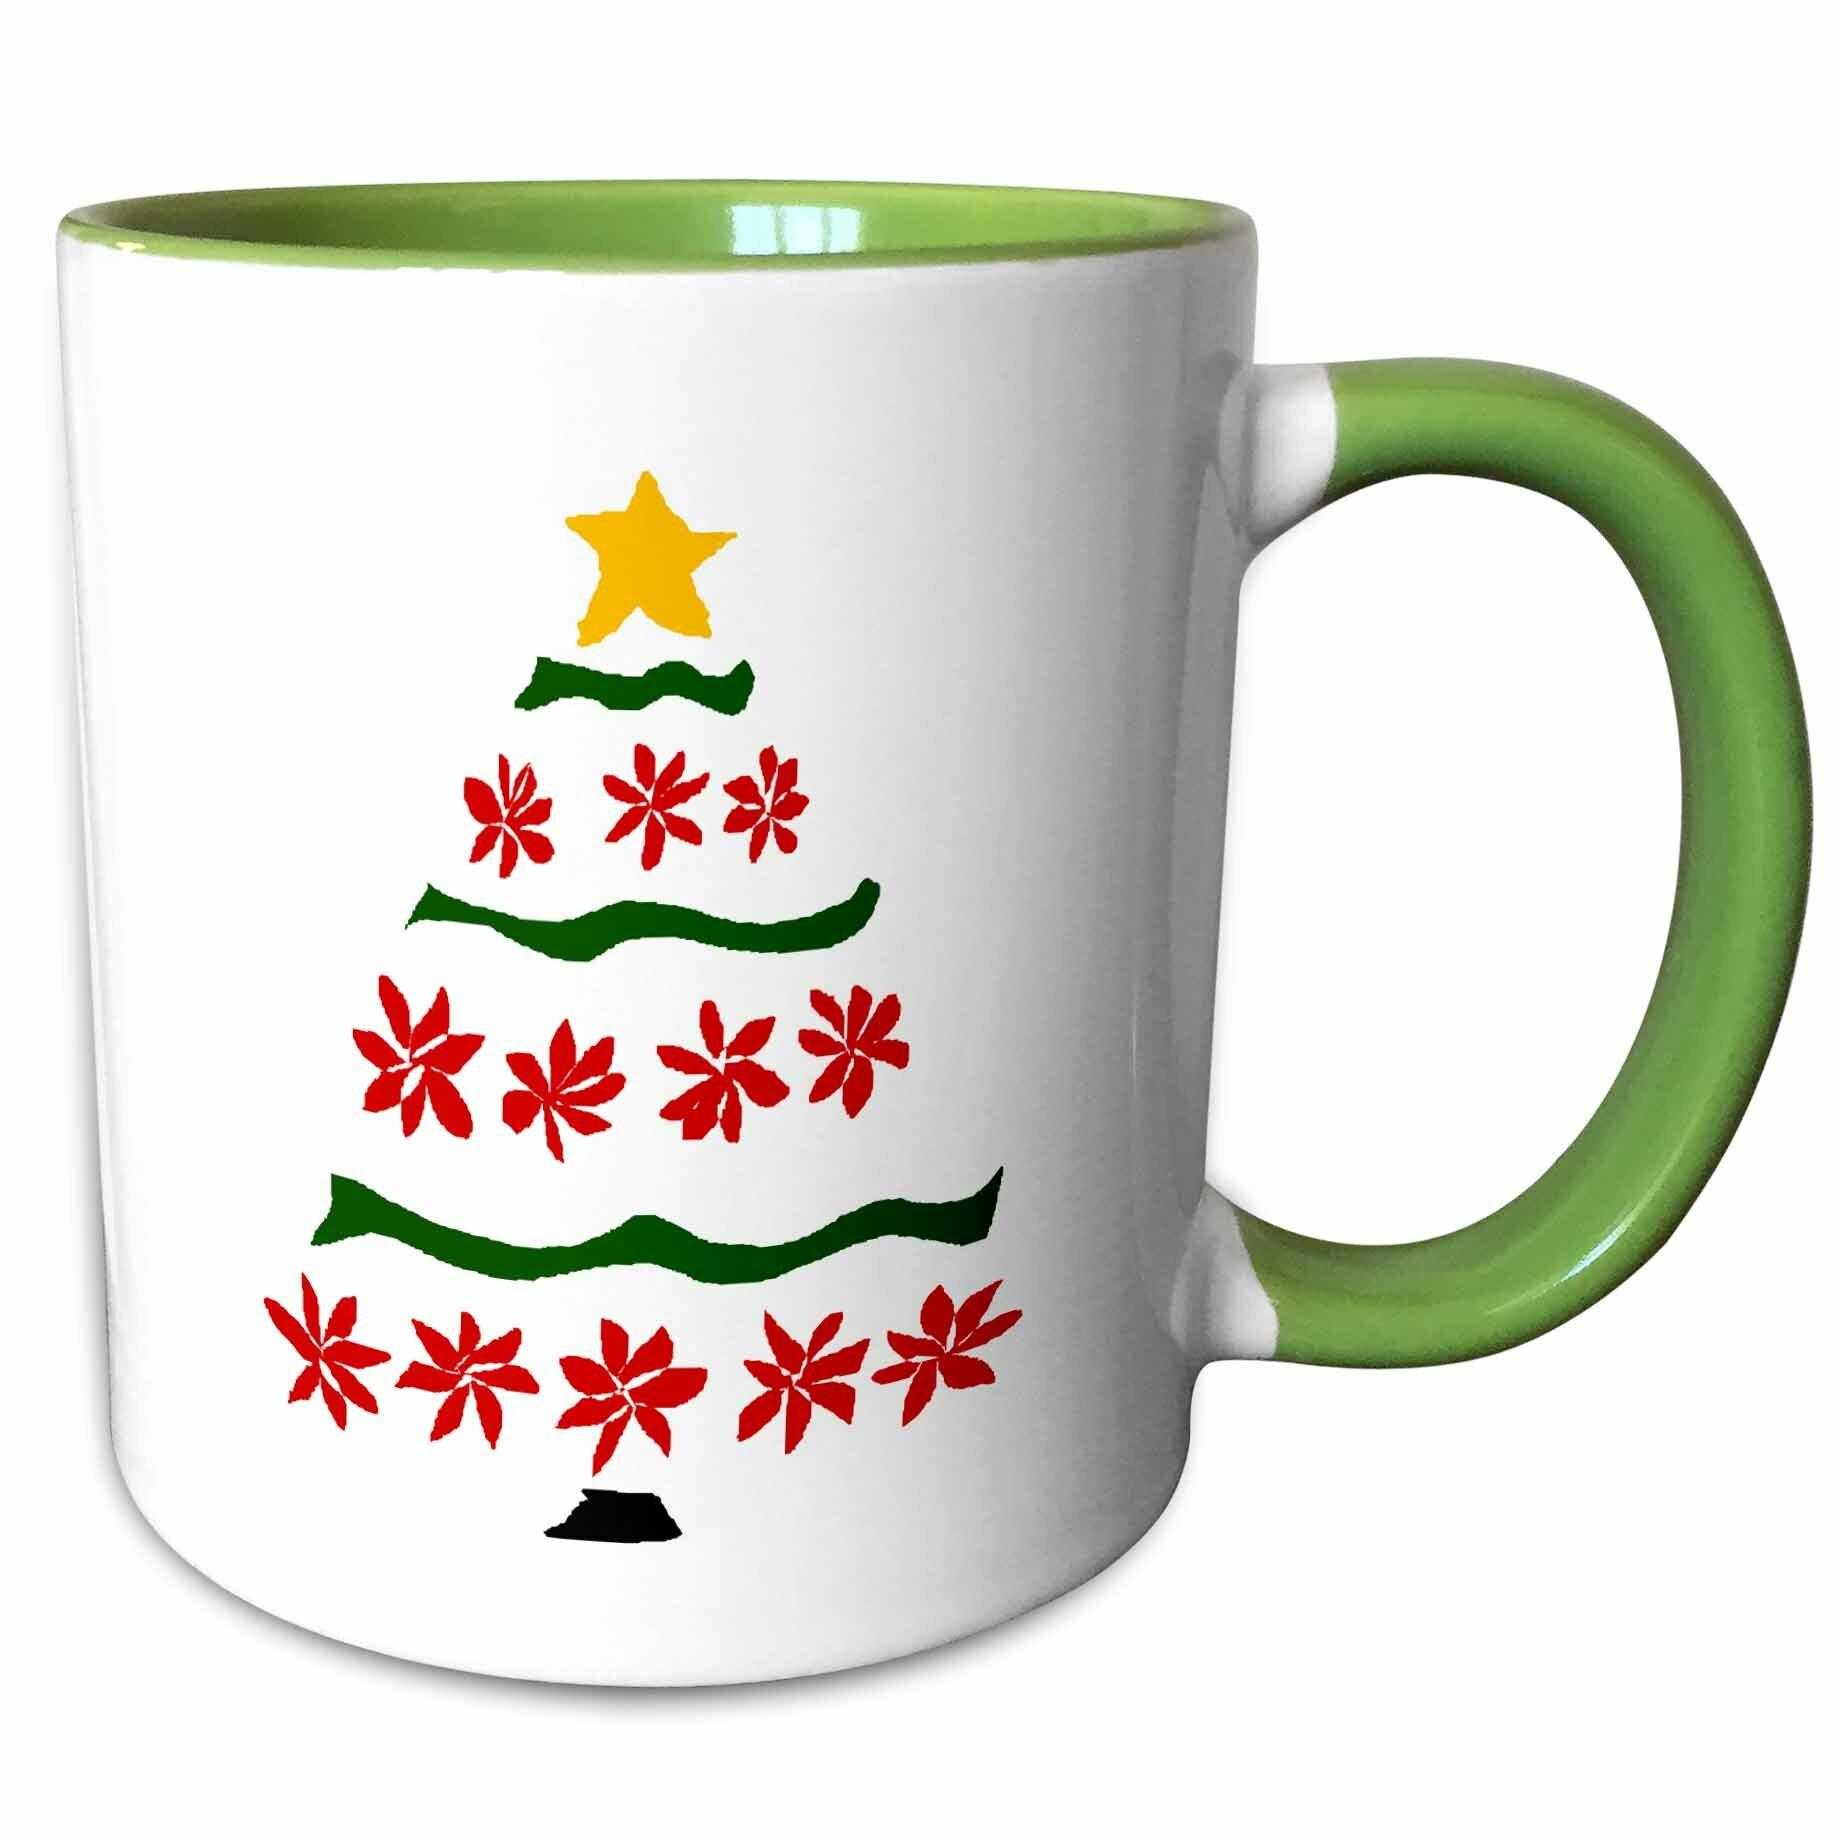 East Urban Home Tadi Artistic Poinsettia Flowers And Ribbons Art Christmas Tree Coffee Mug Wayfair